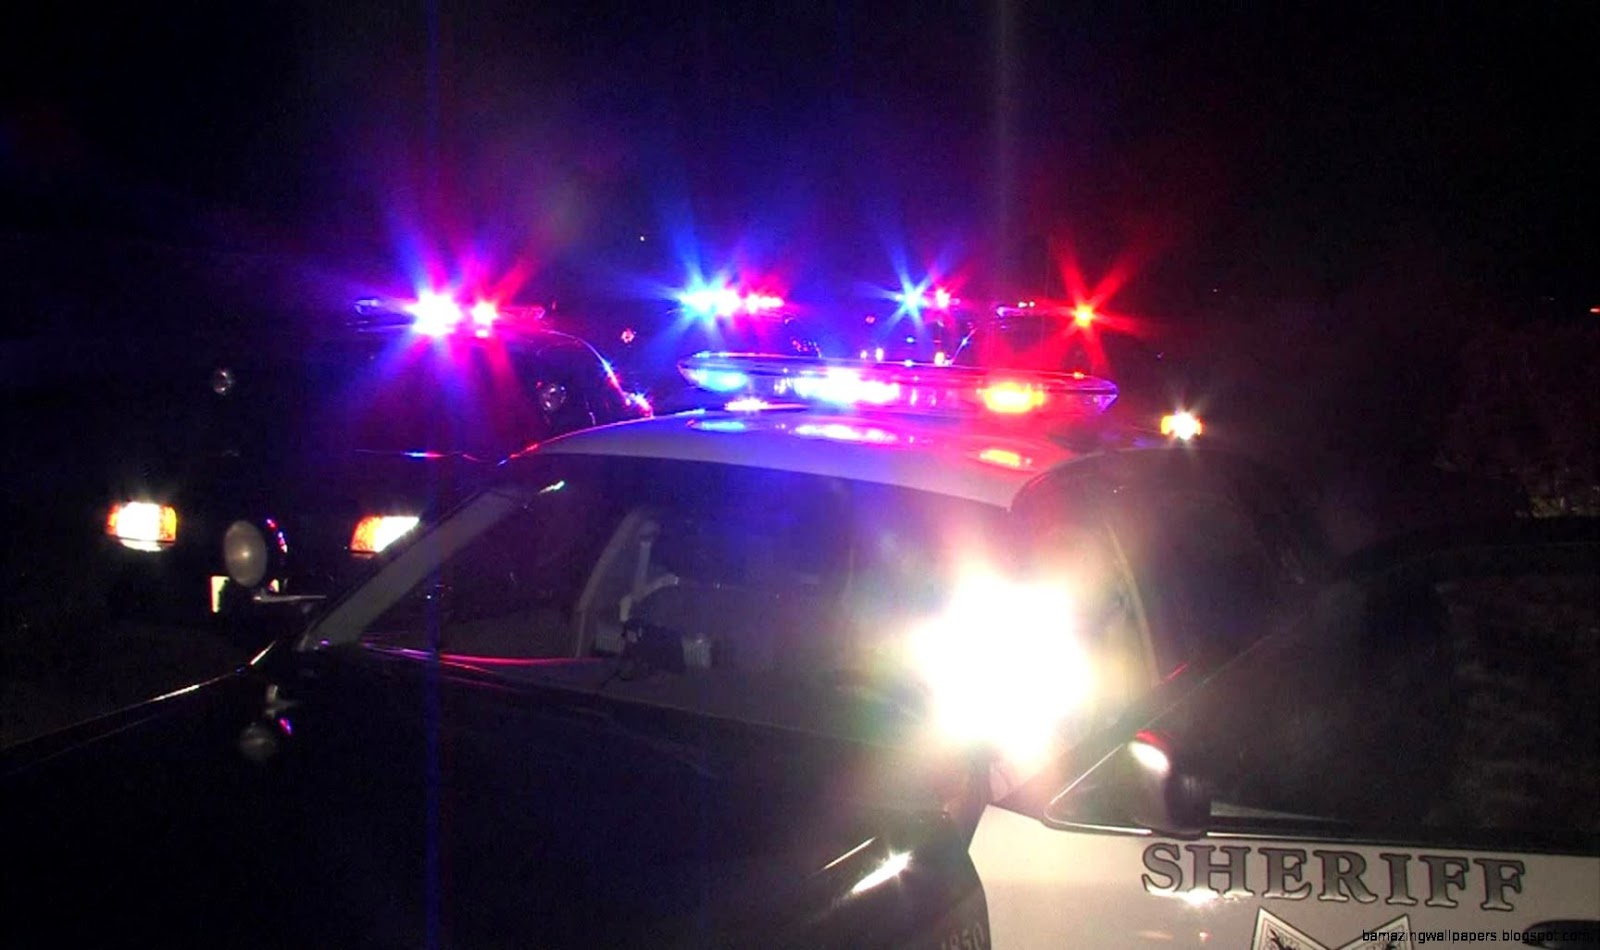 police-car-with-flashing-lights